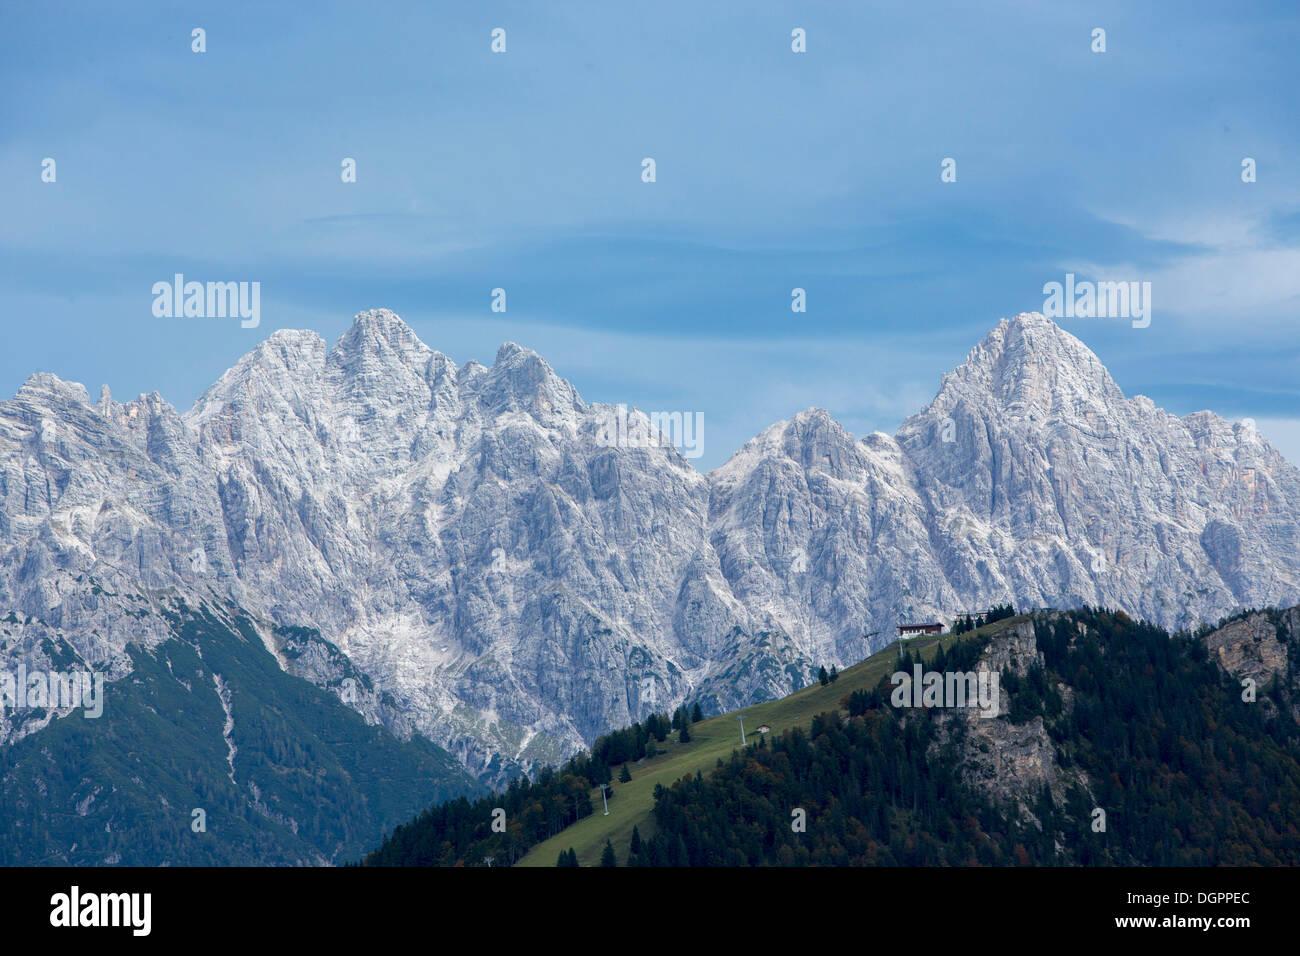 Loferer Steinberge mountain range with foothill Buchensteinwand at front, from Mt Laerchfilzkogel near Fieberbrunnl, Tyrol - Stock Image